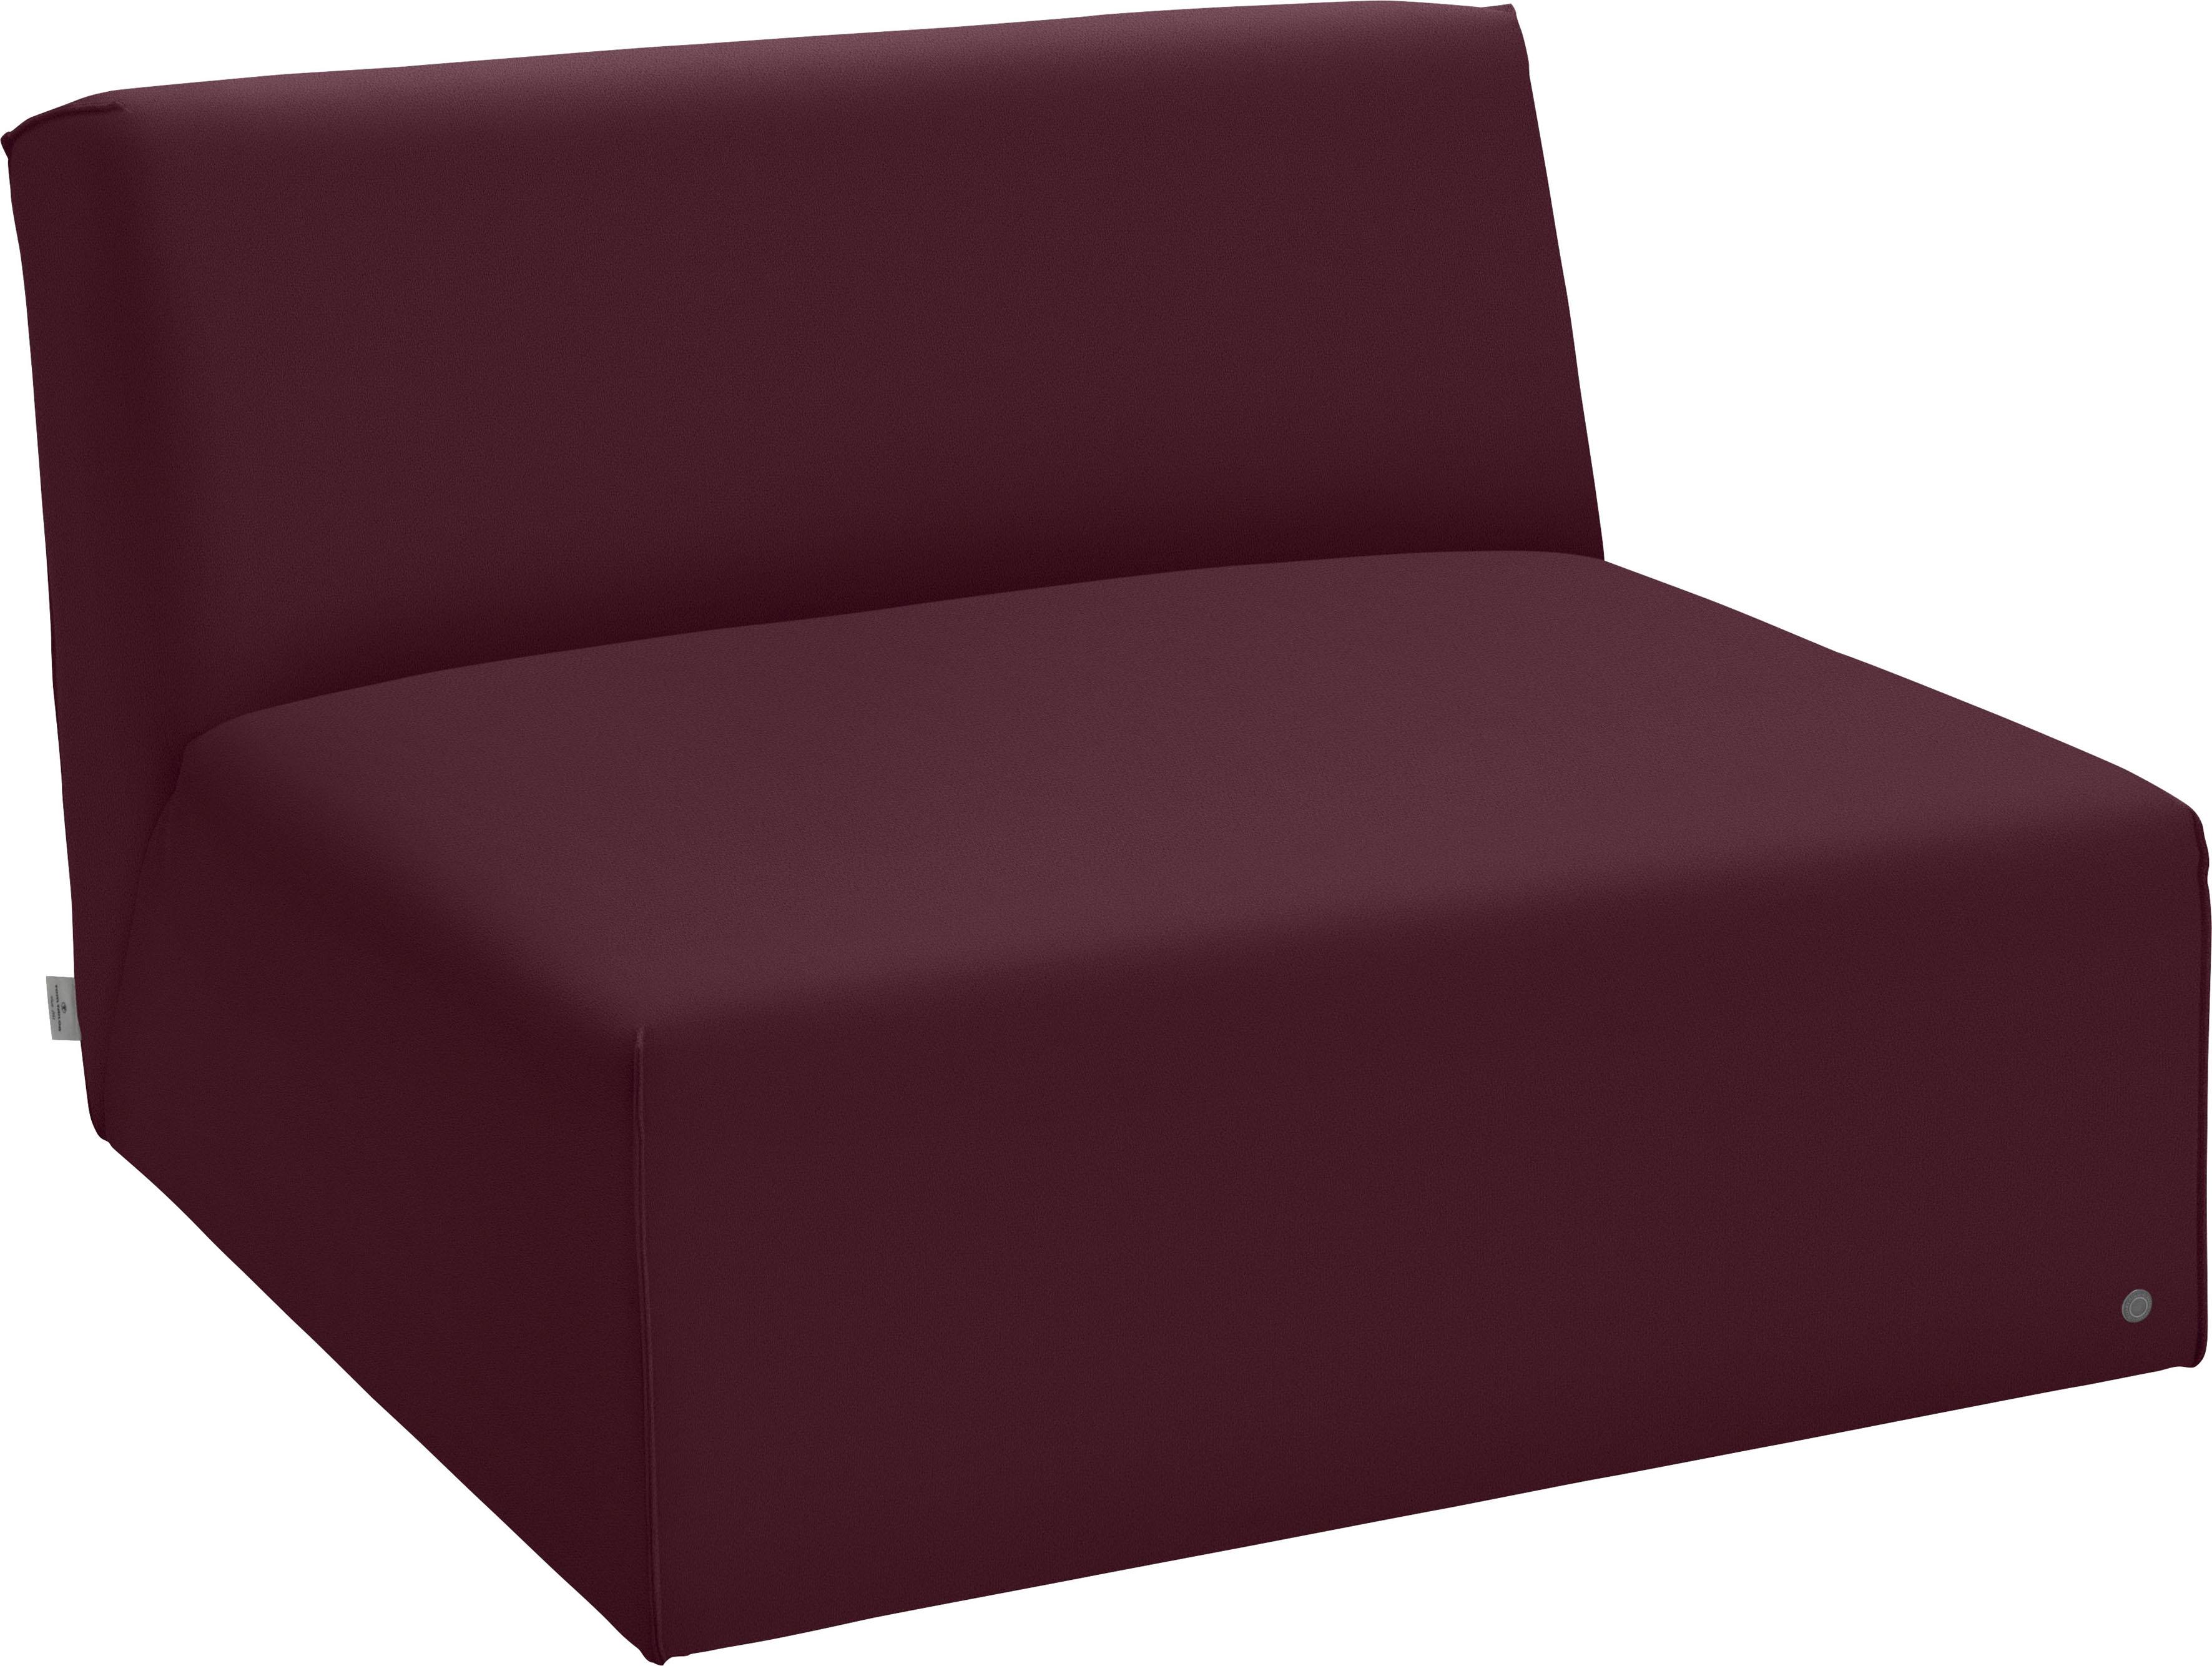 TOM TAILOR Sofaelement ELEMENTS, Sitzelement ohne Armlehne rot Sofaelemente Sofas Couches